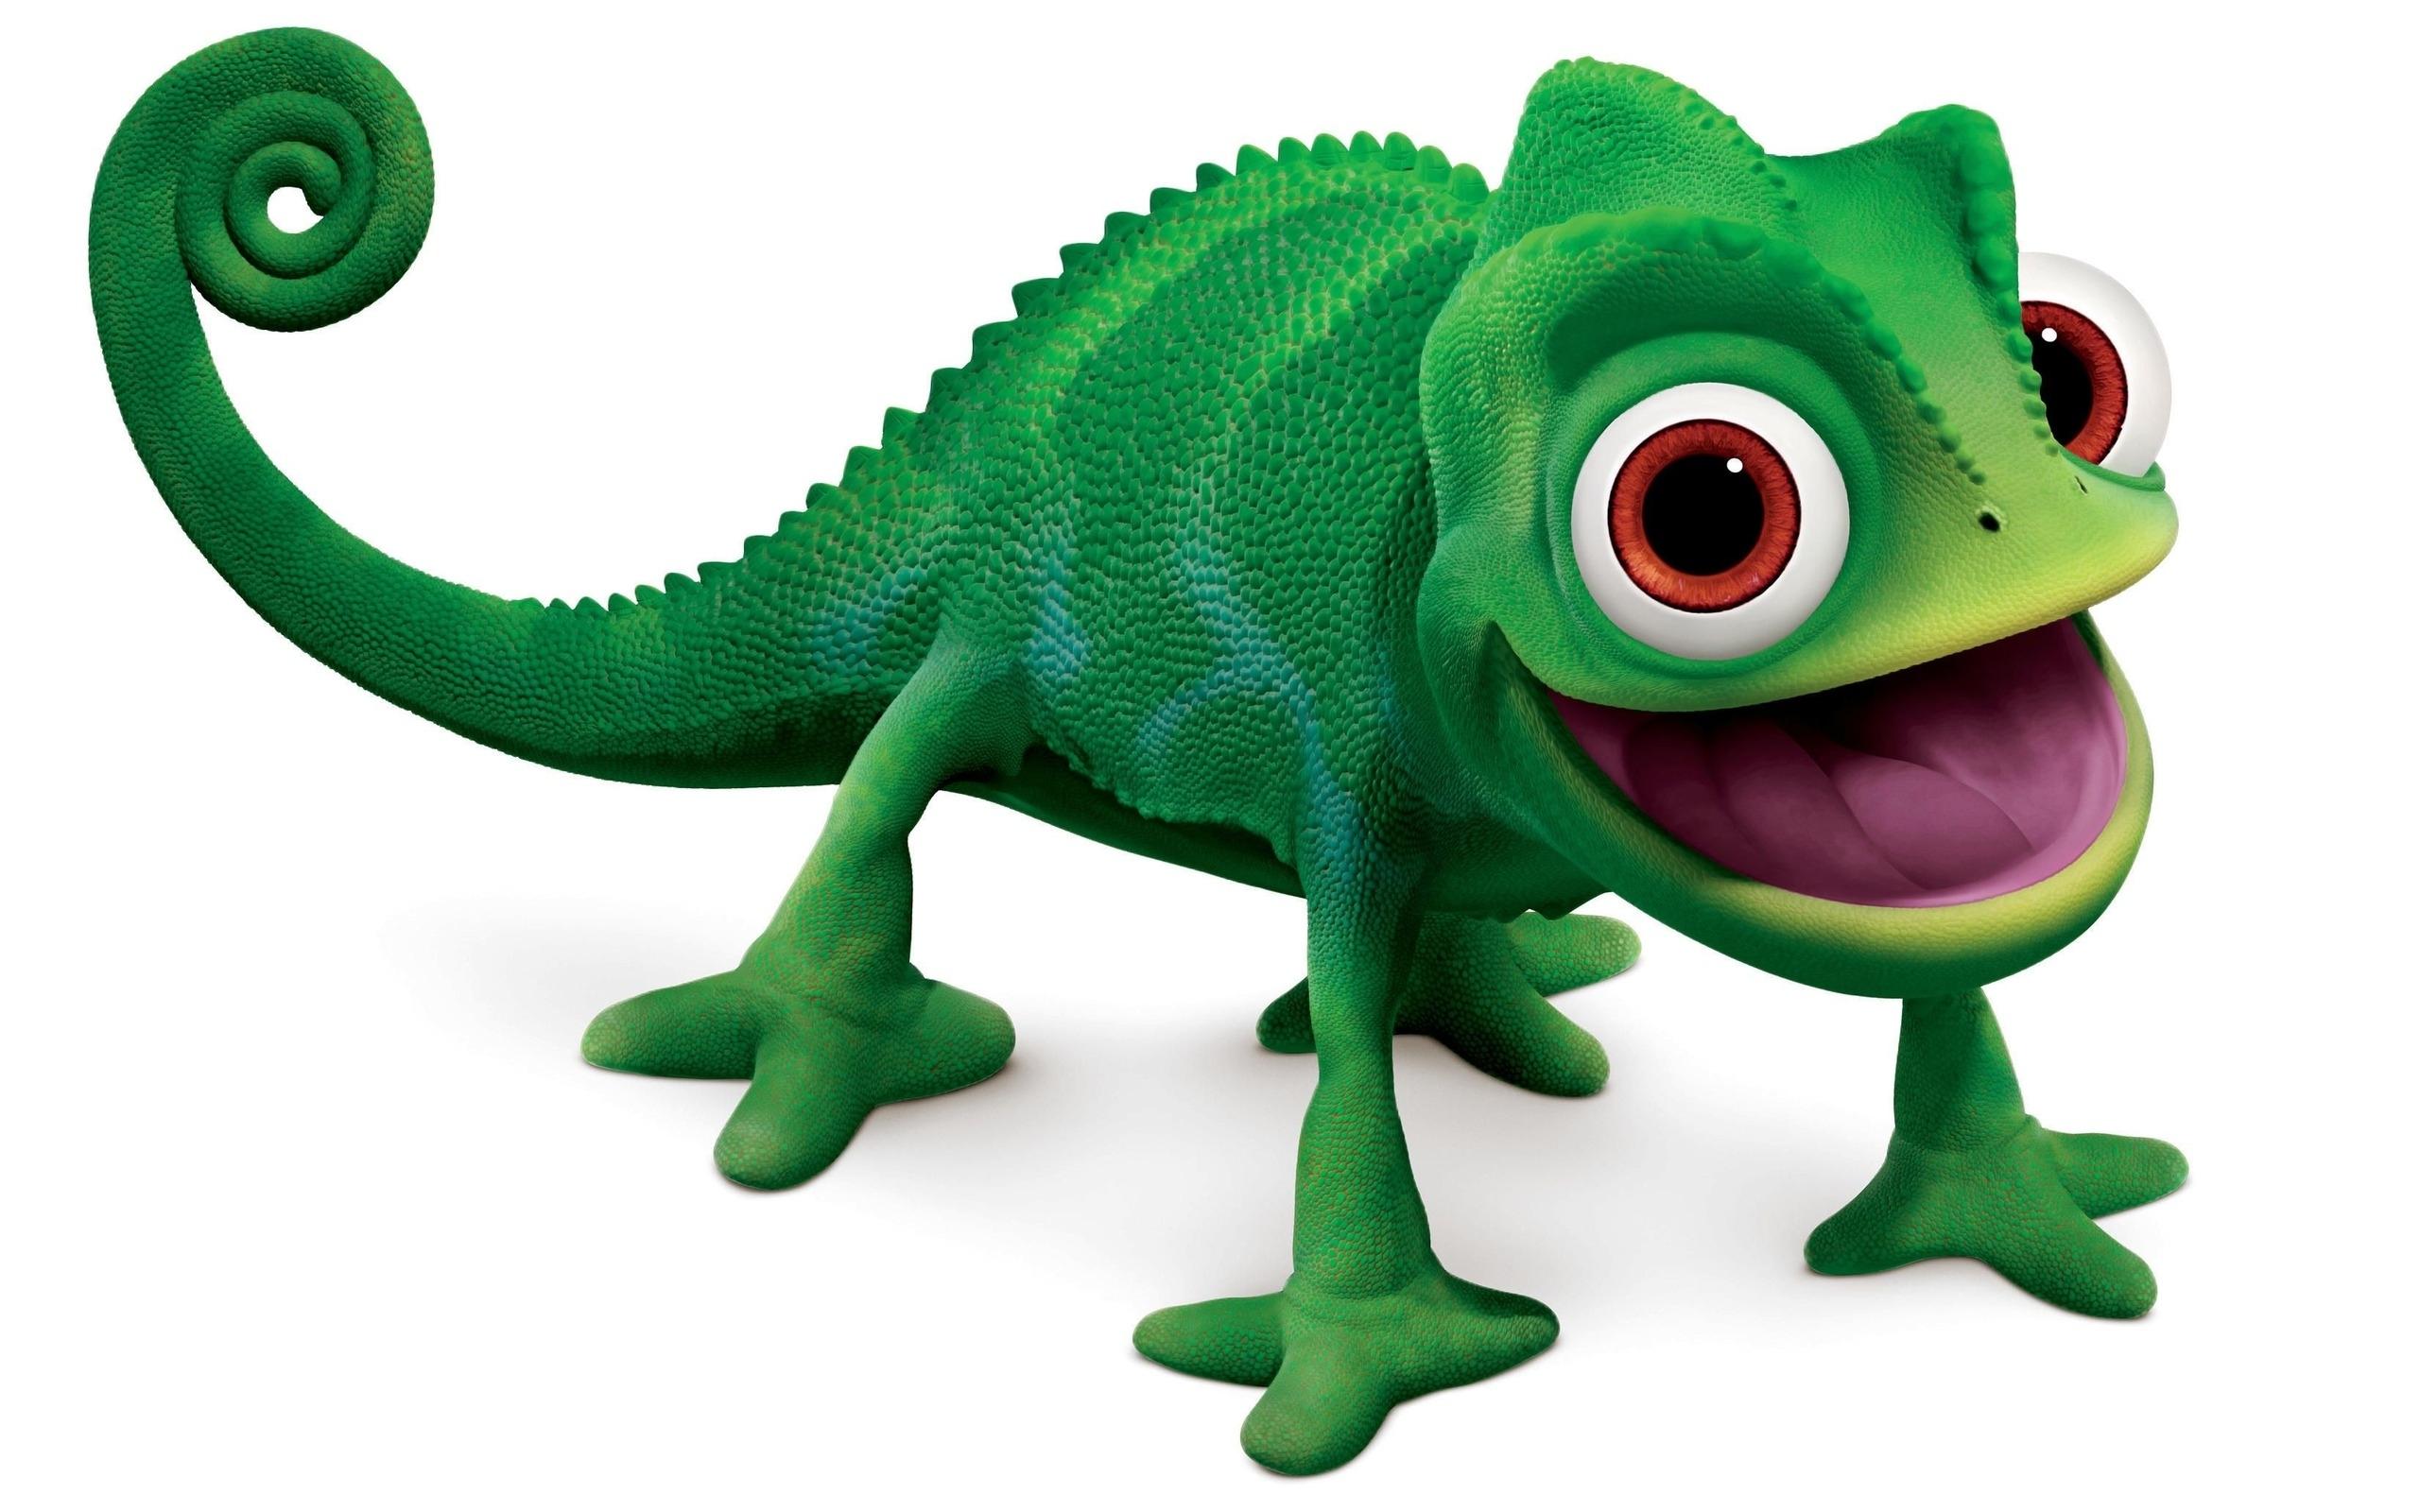 1000+ images about chameleons on Pinterest.